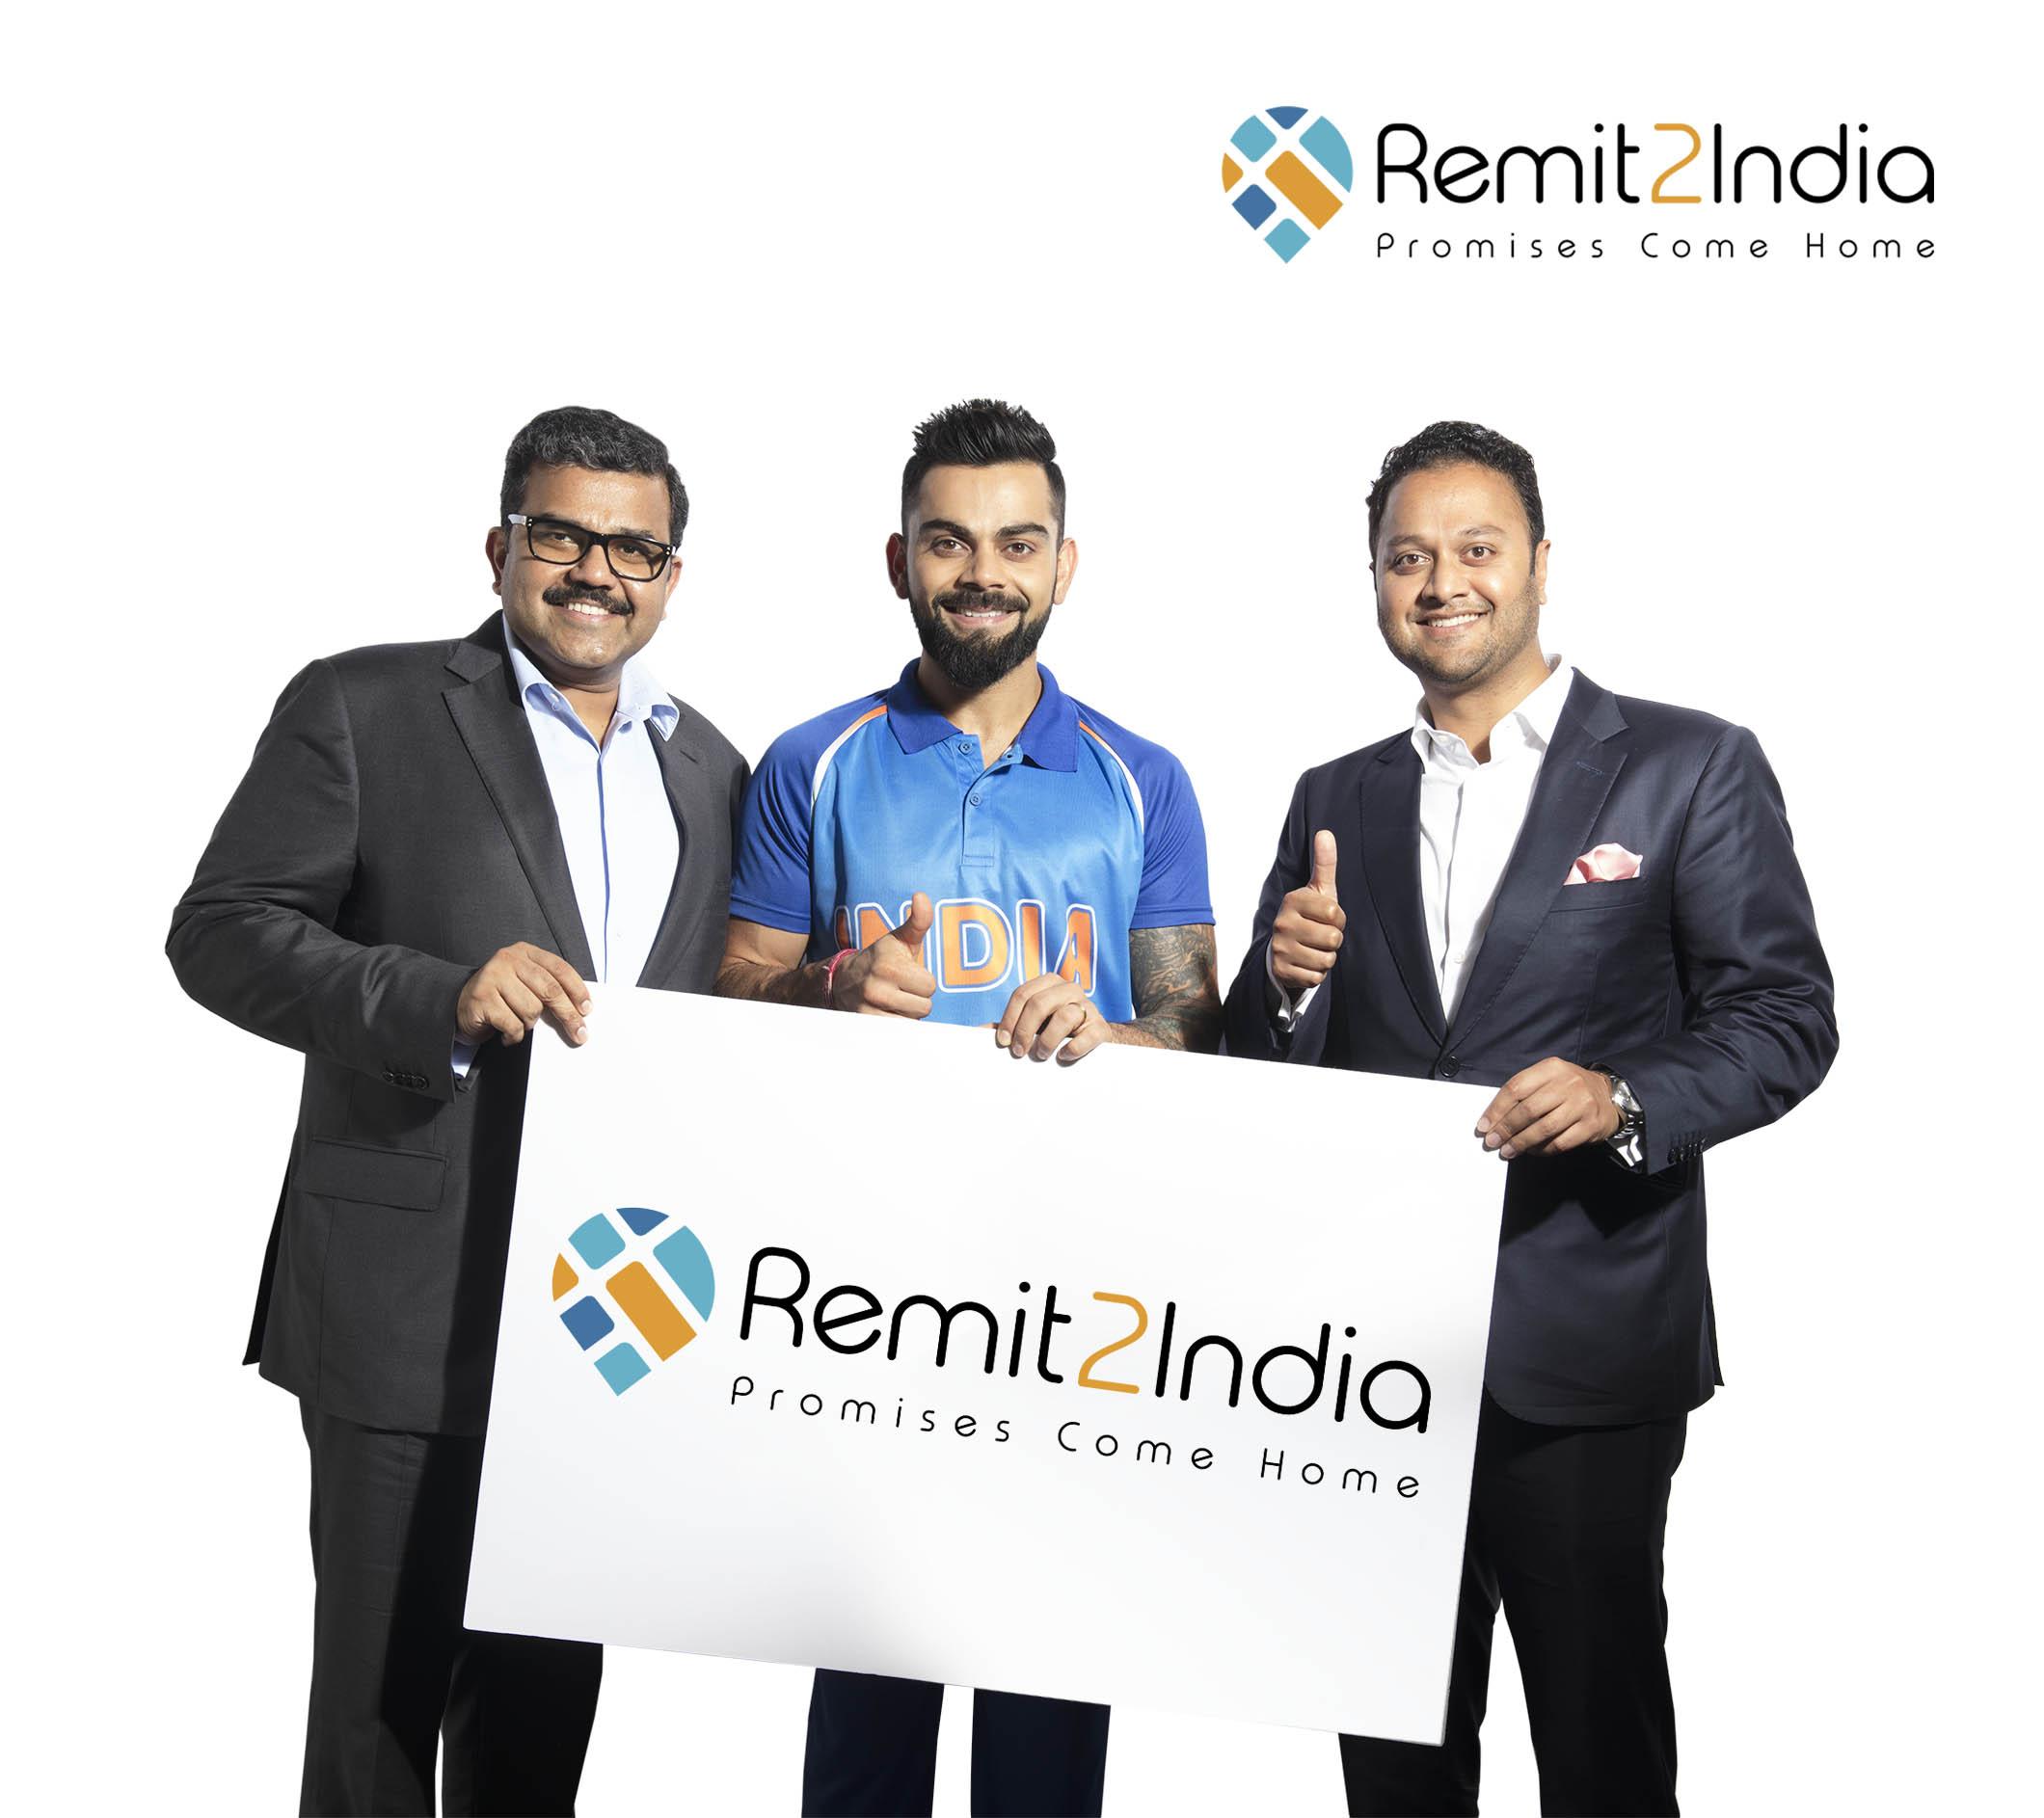 Remit2India Unveils Cricketer Virat Kohli as Brand Ambassador